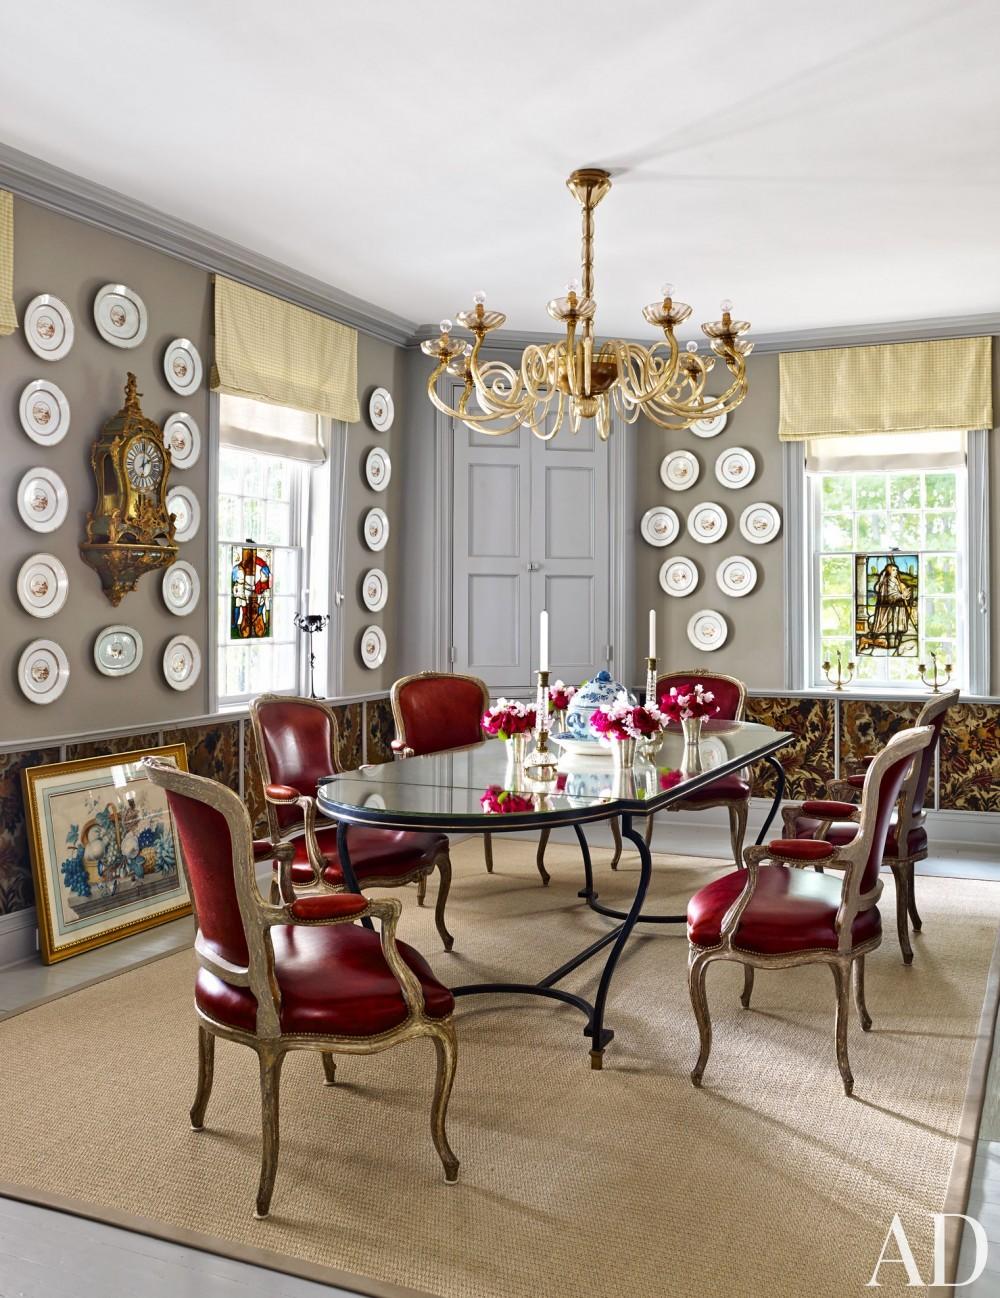 Traditional Dining Room by D\'Aquino Monaco and D\'Aquino Monaco in Hudson River Valley, NY